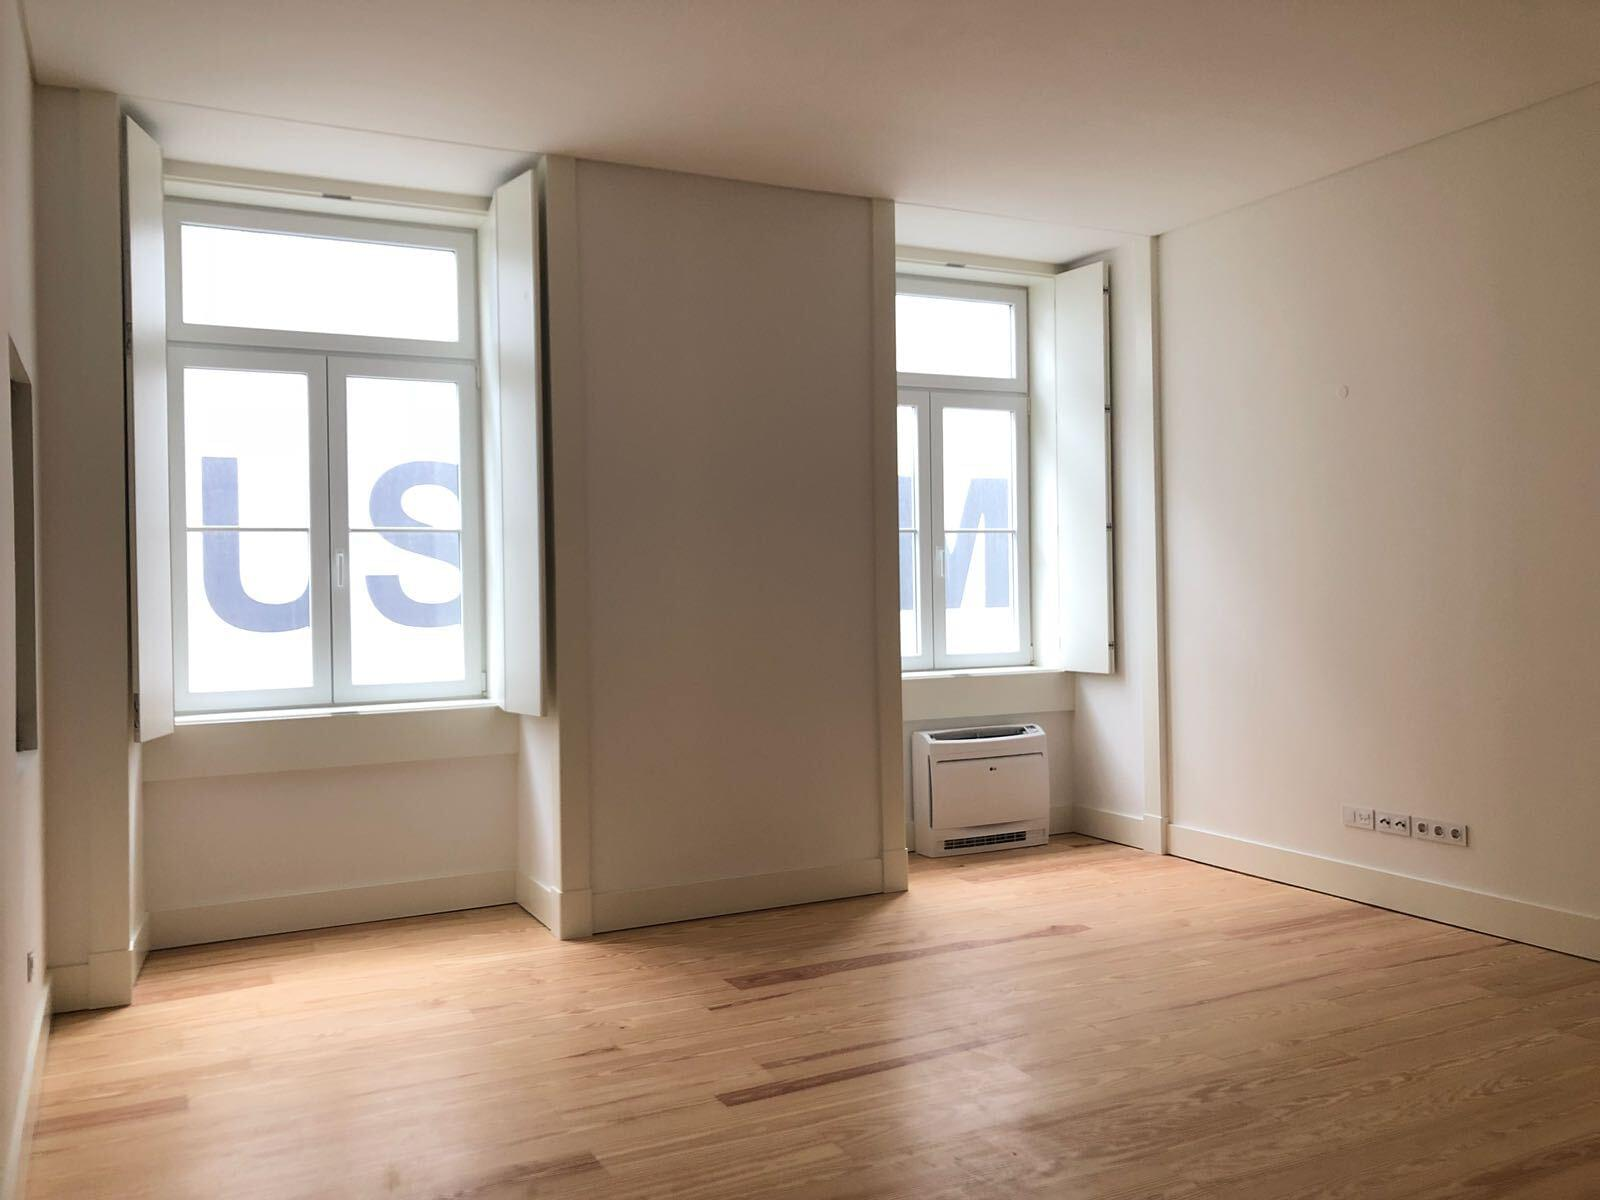 pf17142-apartamento-t2-lisboa-8a39bd99-fccd-4b6b-a1b3-5bd525c0d421